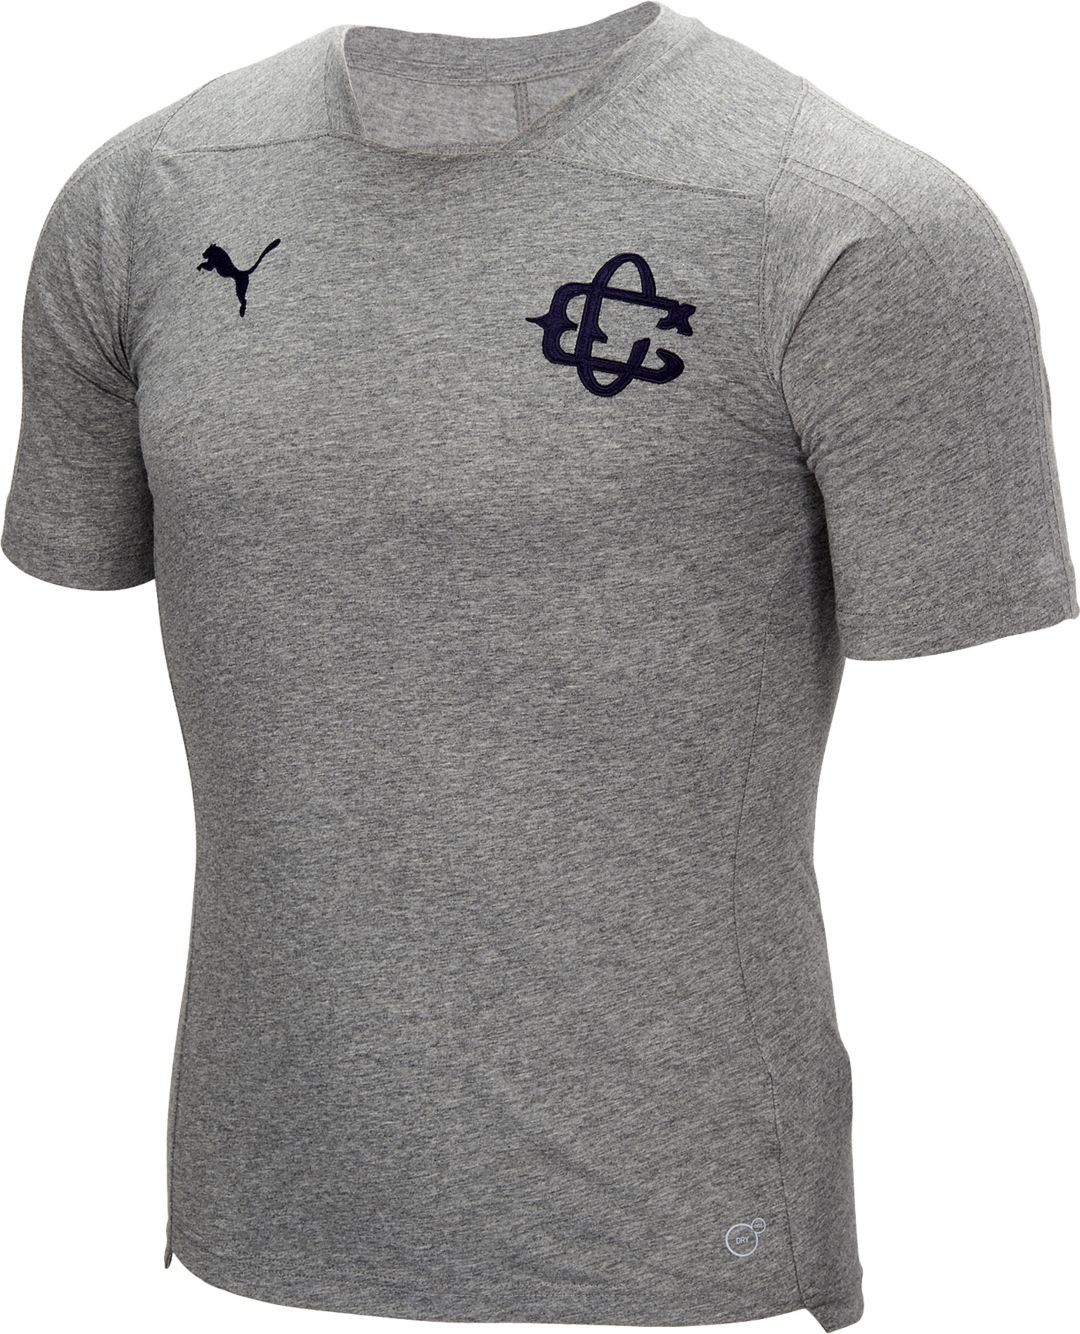 8ca17af3f PUMA Men's Chivas Guadalajara Grey Crest T-Shirt. noImageFound. Previous